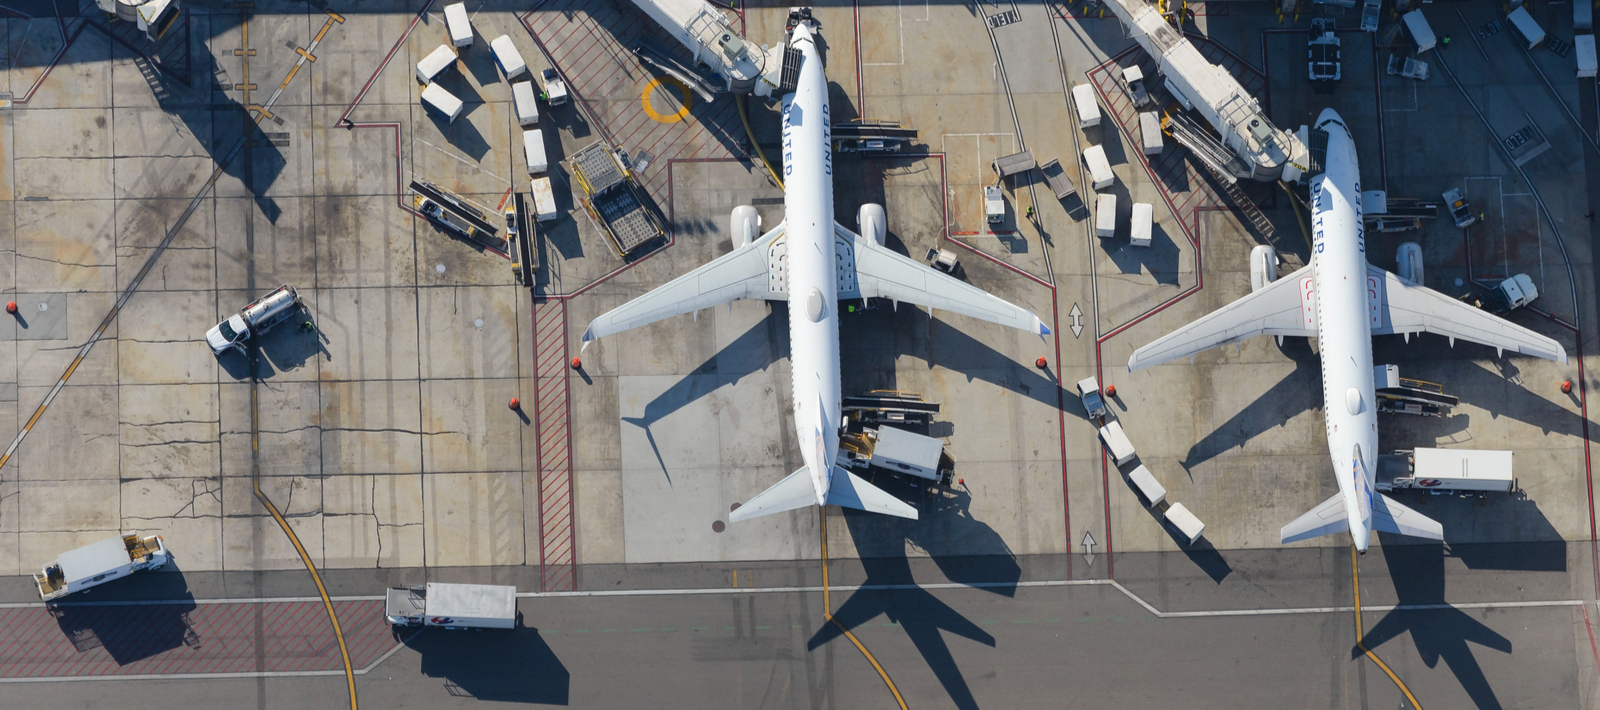 Interline flight